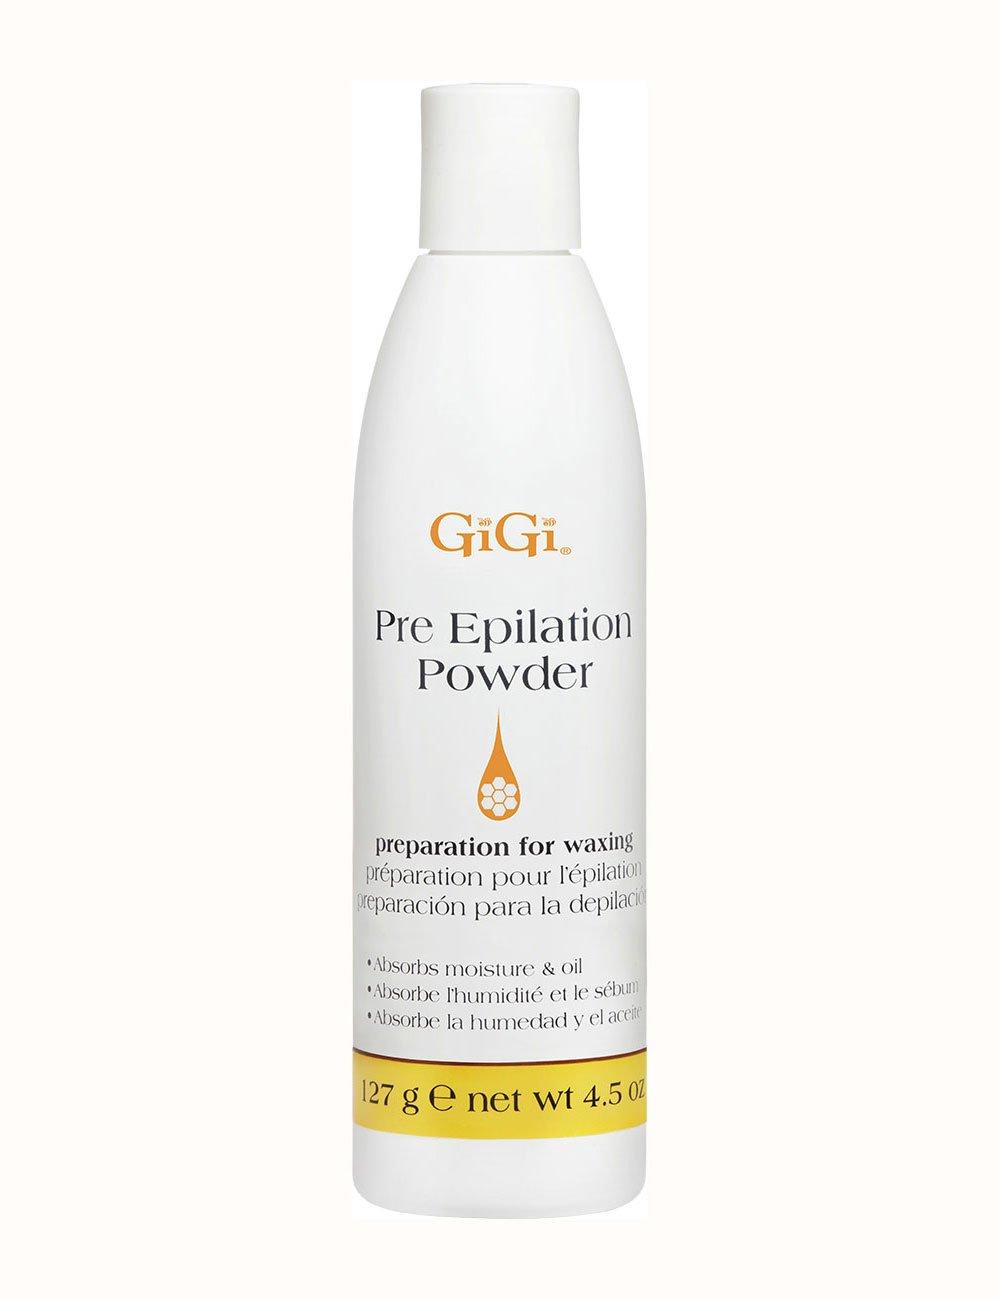 GiGi Pre Epilation Dusting Powder, 4.5 Ounce